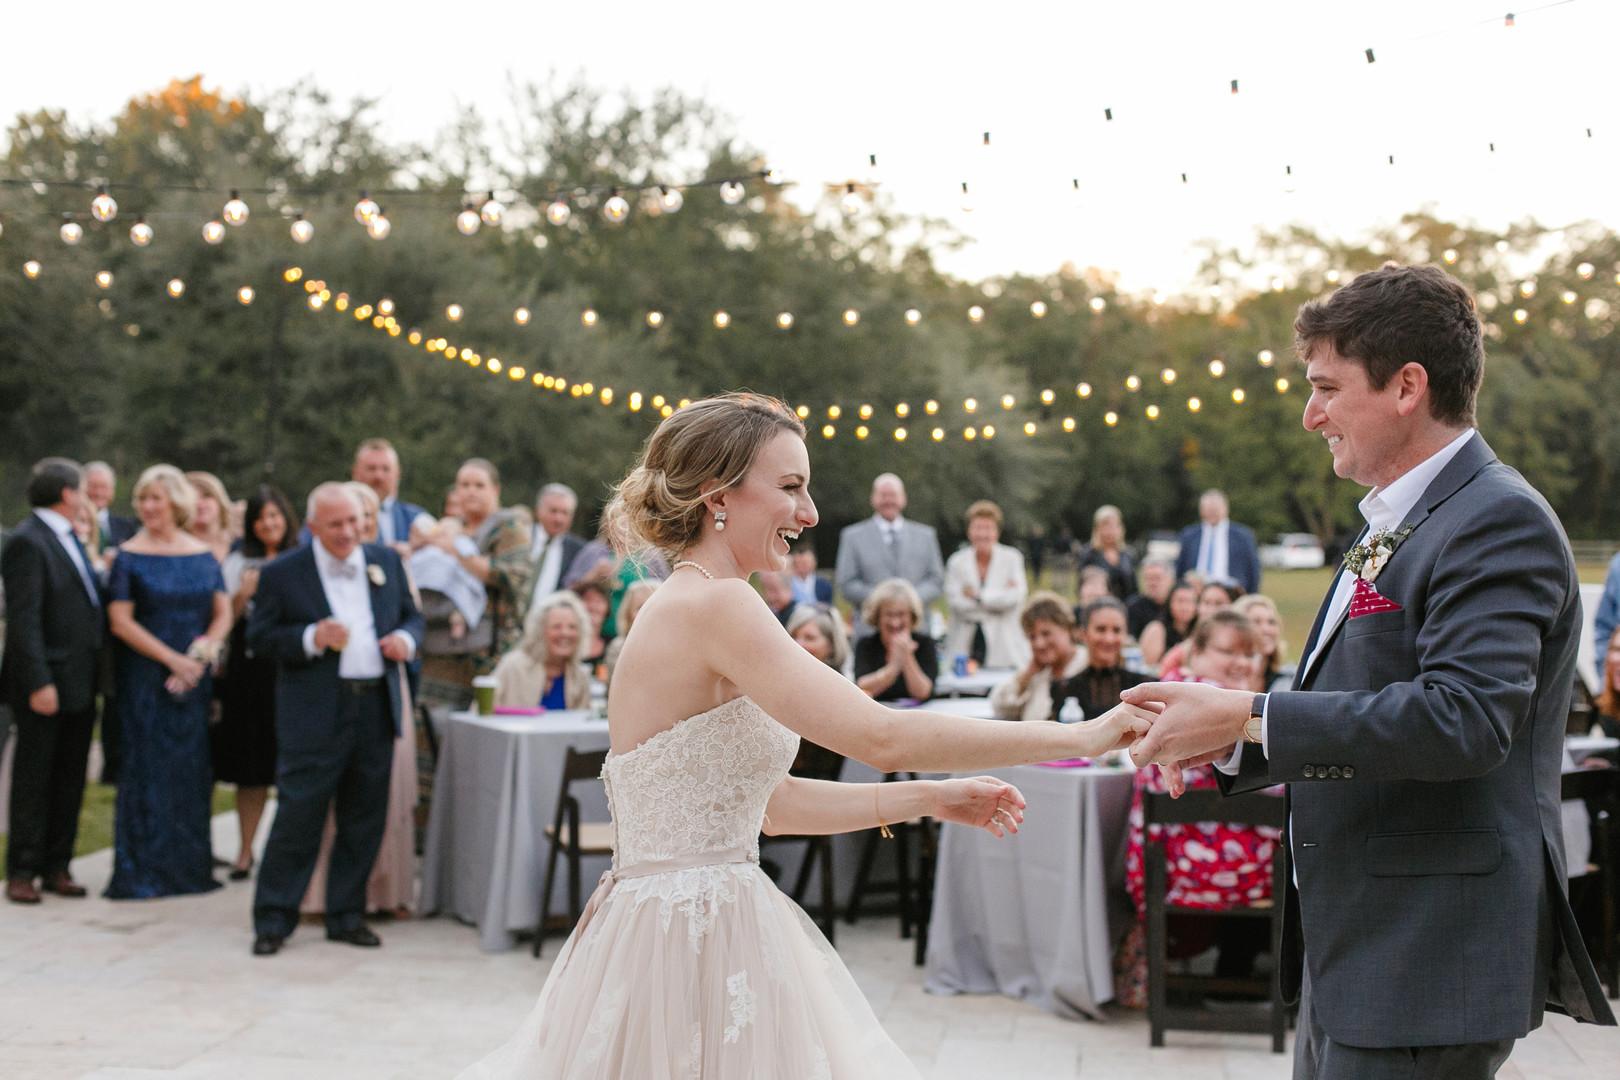 old-wide-awake-plantation-wedding-39.JPG